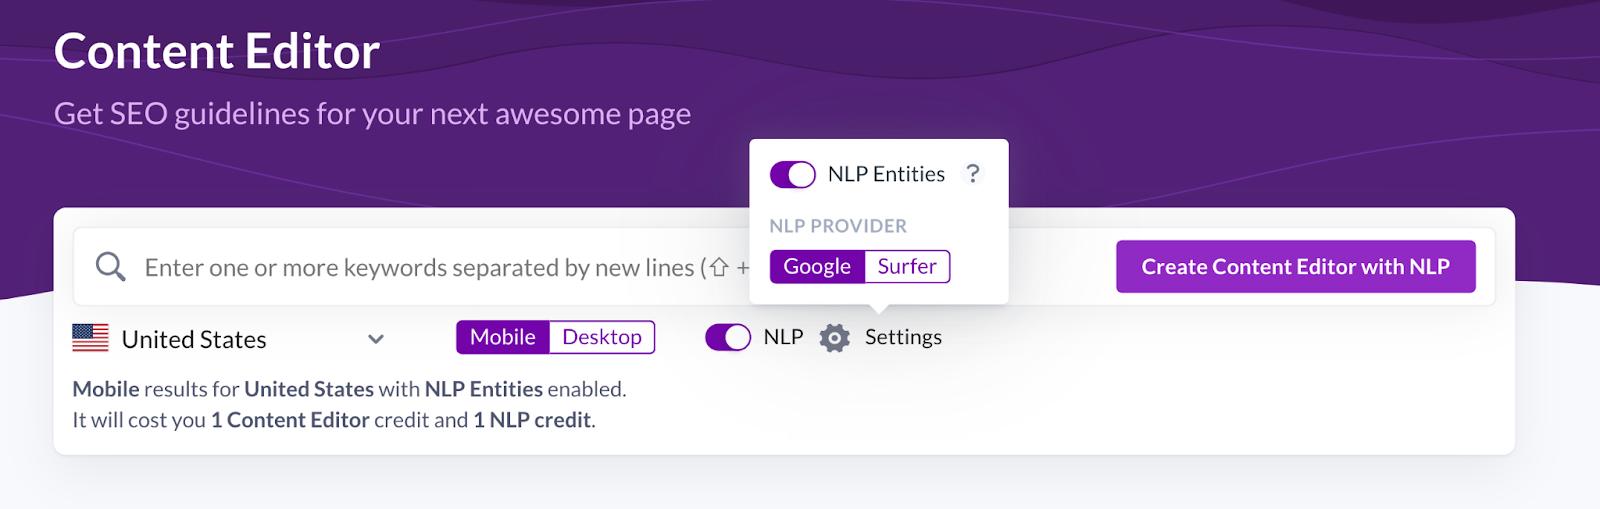 choosing Surfer NLP settings in Content Editor